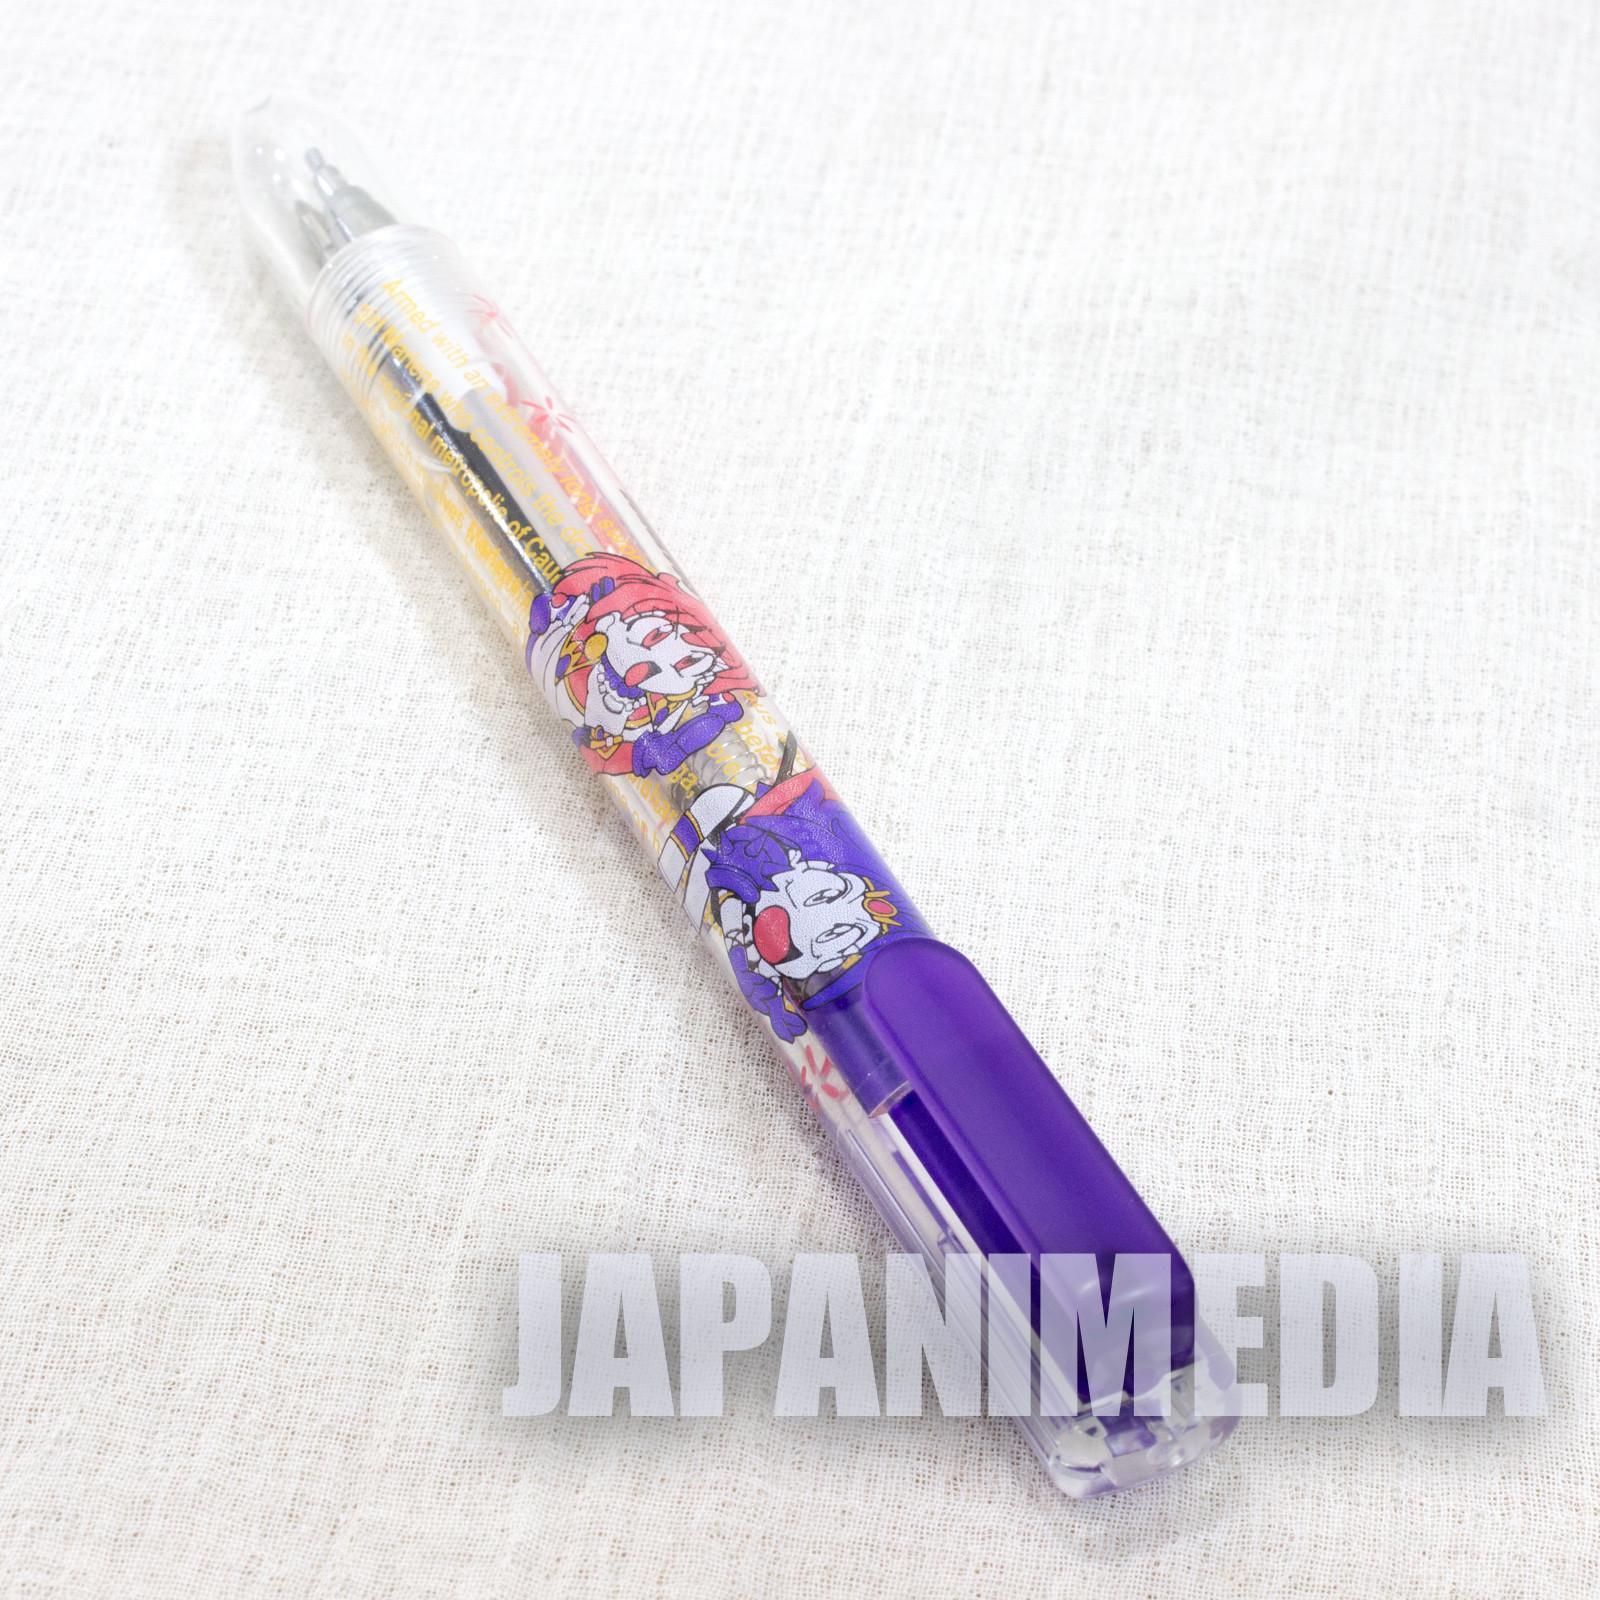 [JUNK!!] Slayers Gorgeous Mechanical pencil  [Lina Inverse / Naga the Serpent] JAPAN ANIME